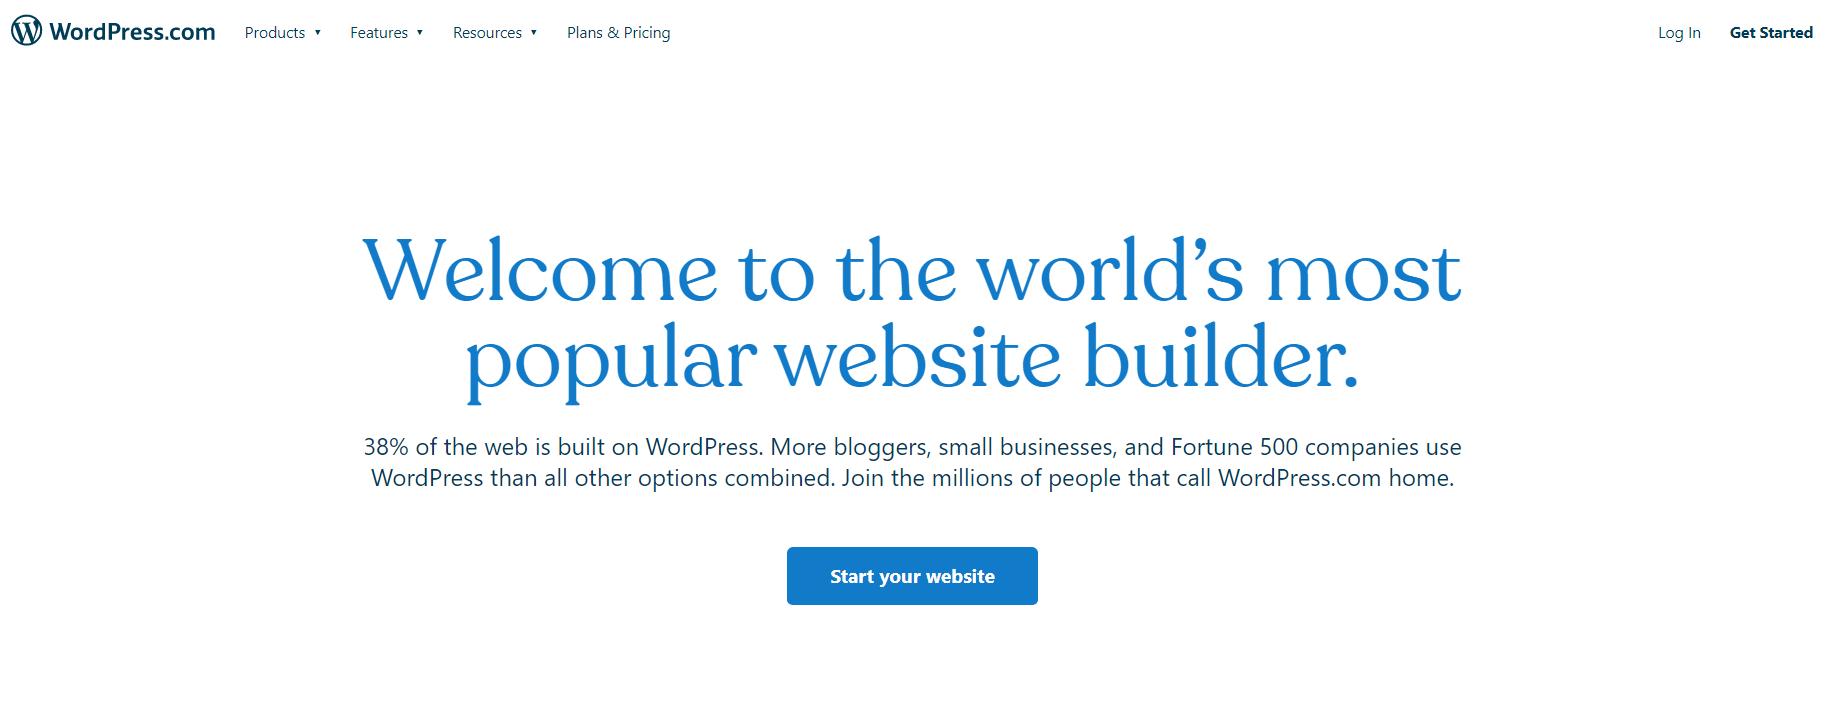 Wordpress.com网站生成器。